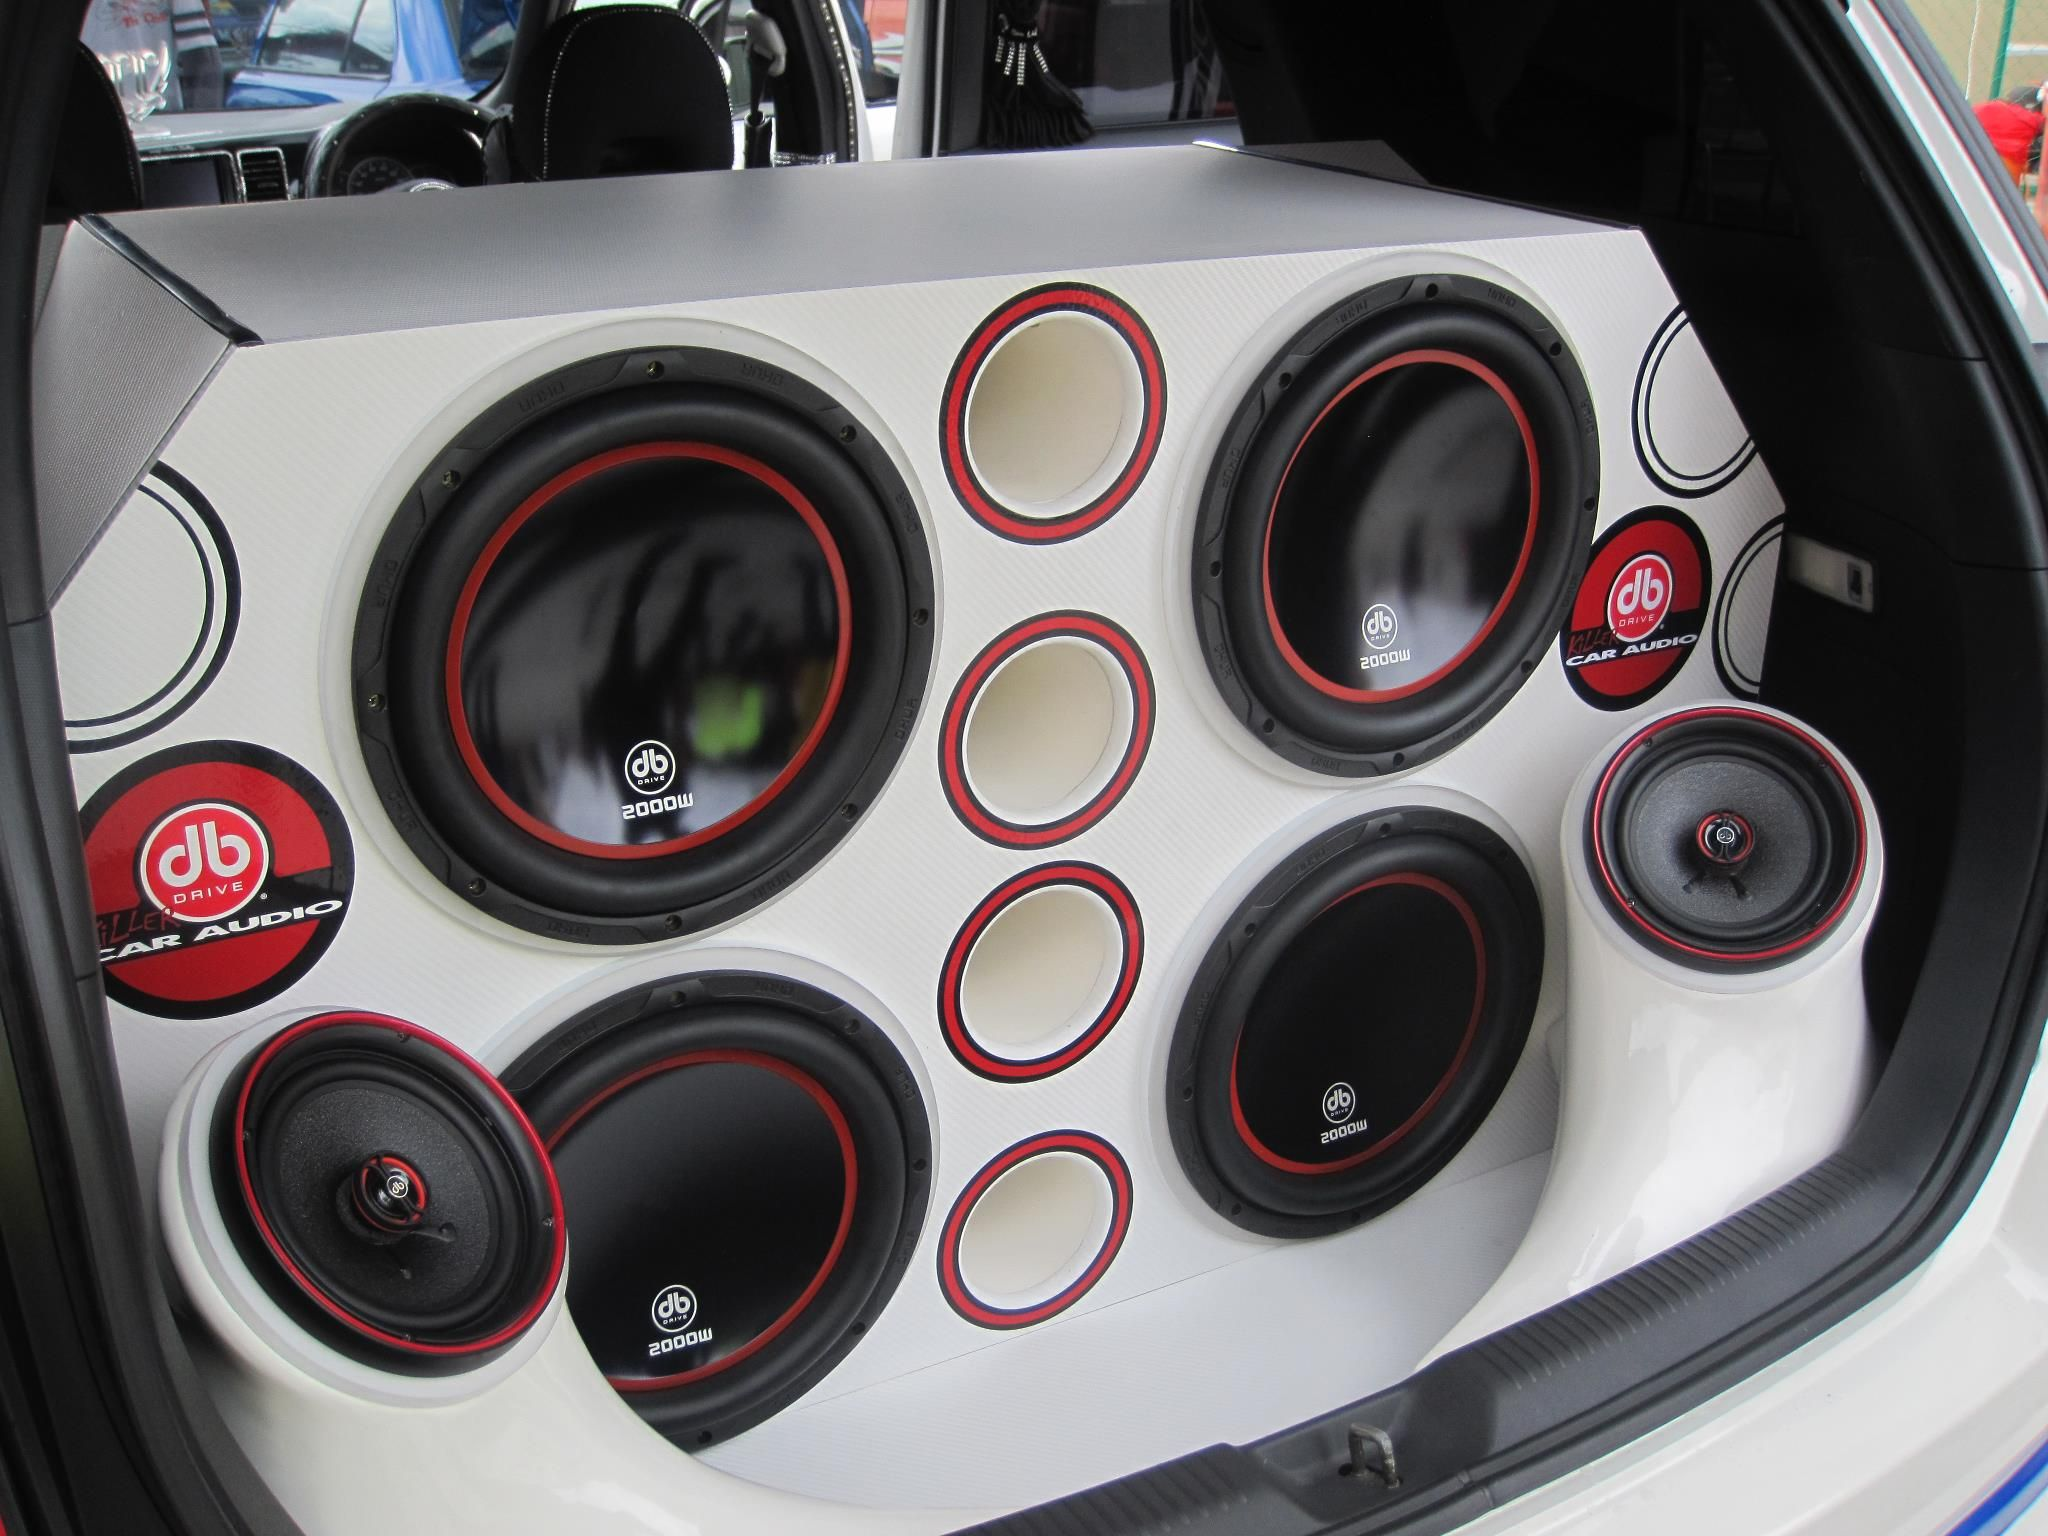 db drive killer car audio instillation db drive puerto rico db drive killer car audio instillation